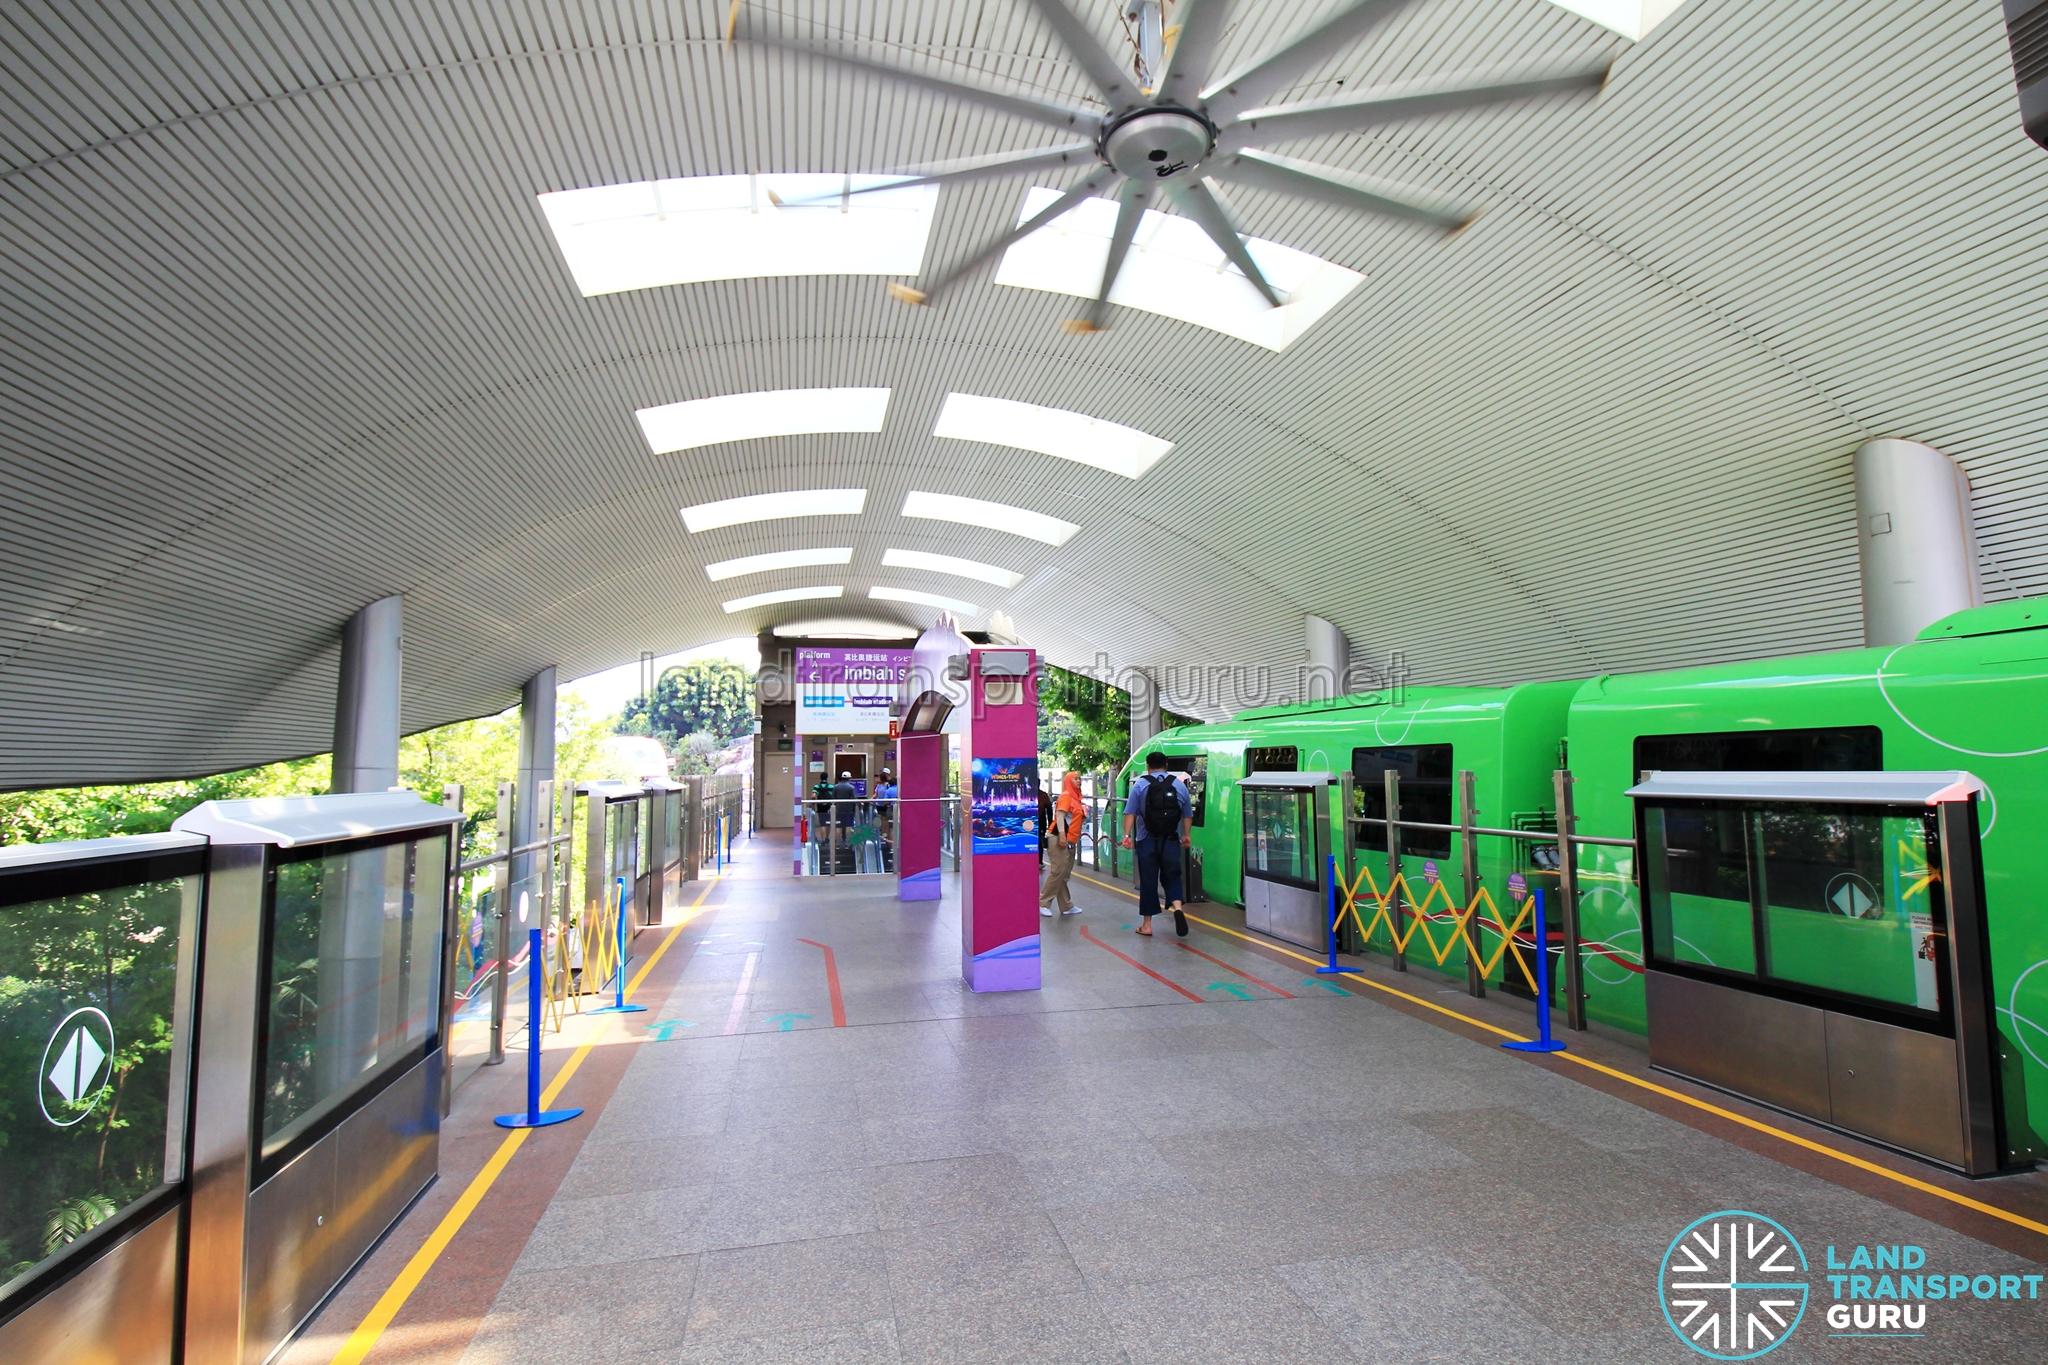 Sentosa Express station platform